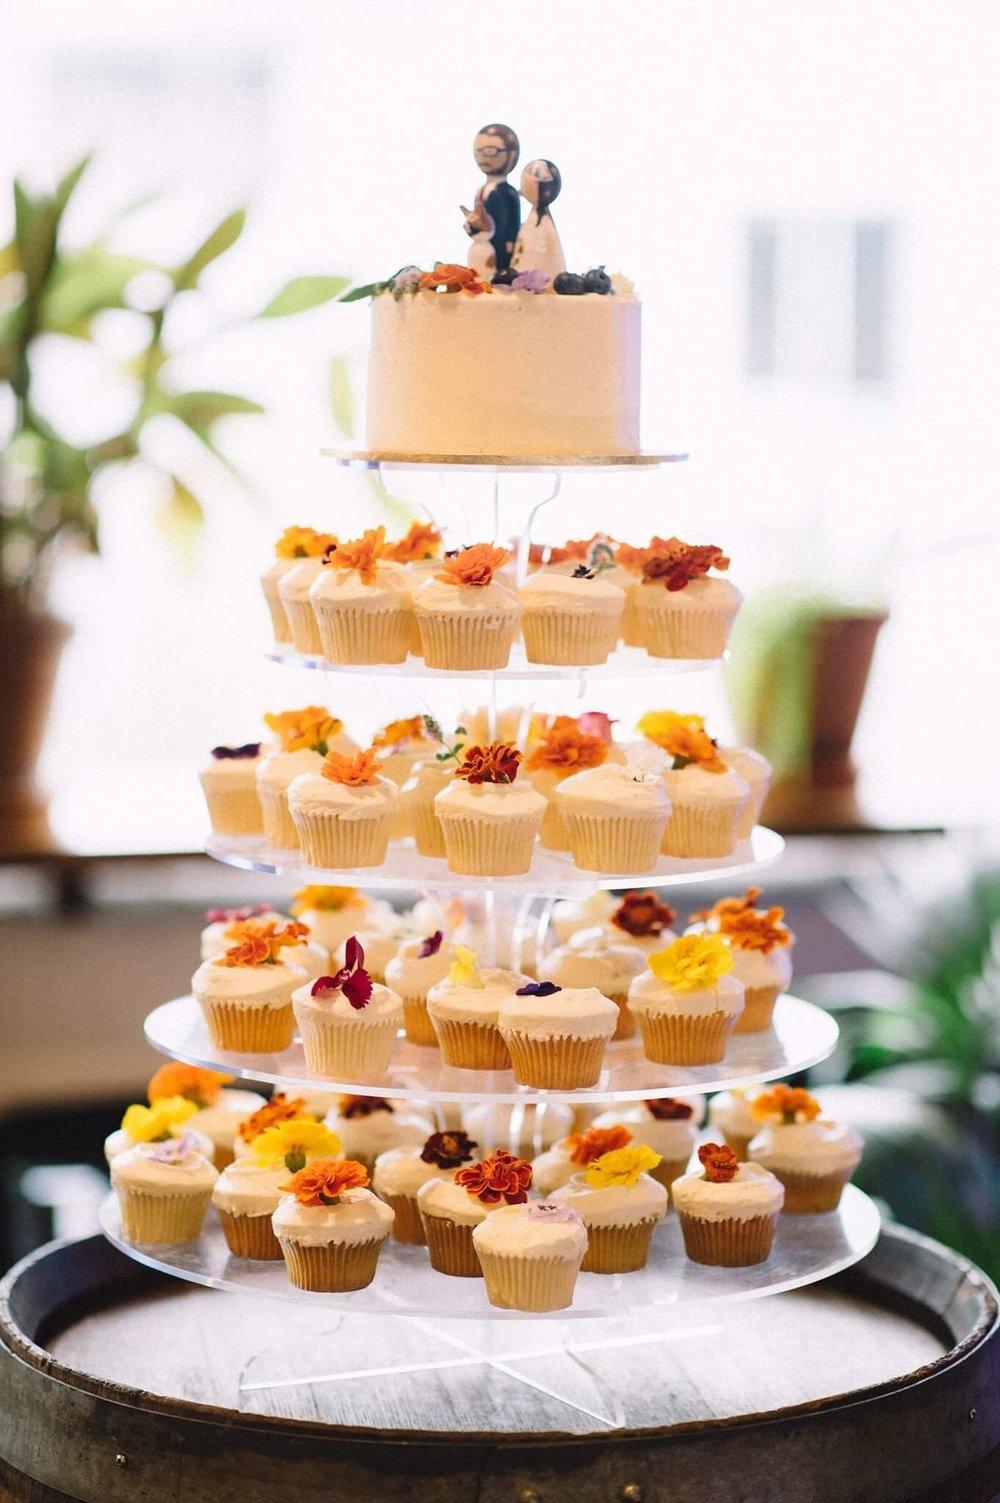 vanillapod-weddingcake-cupcake.jpg